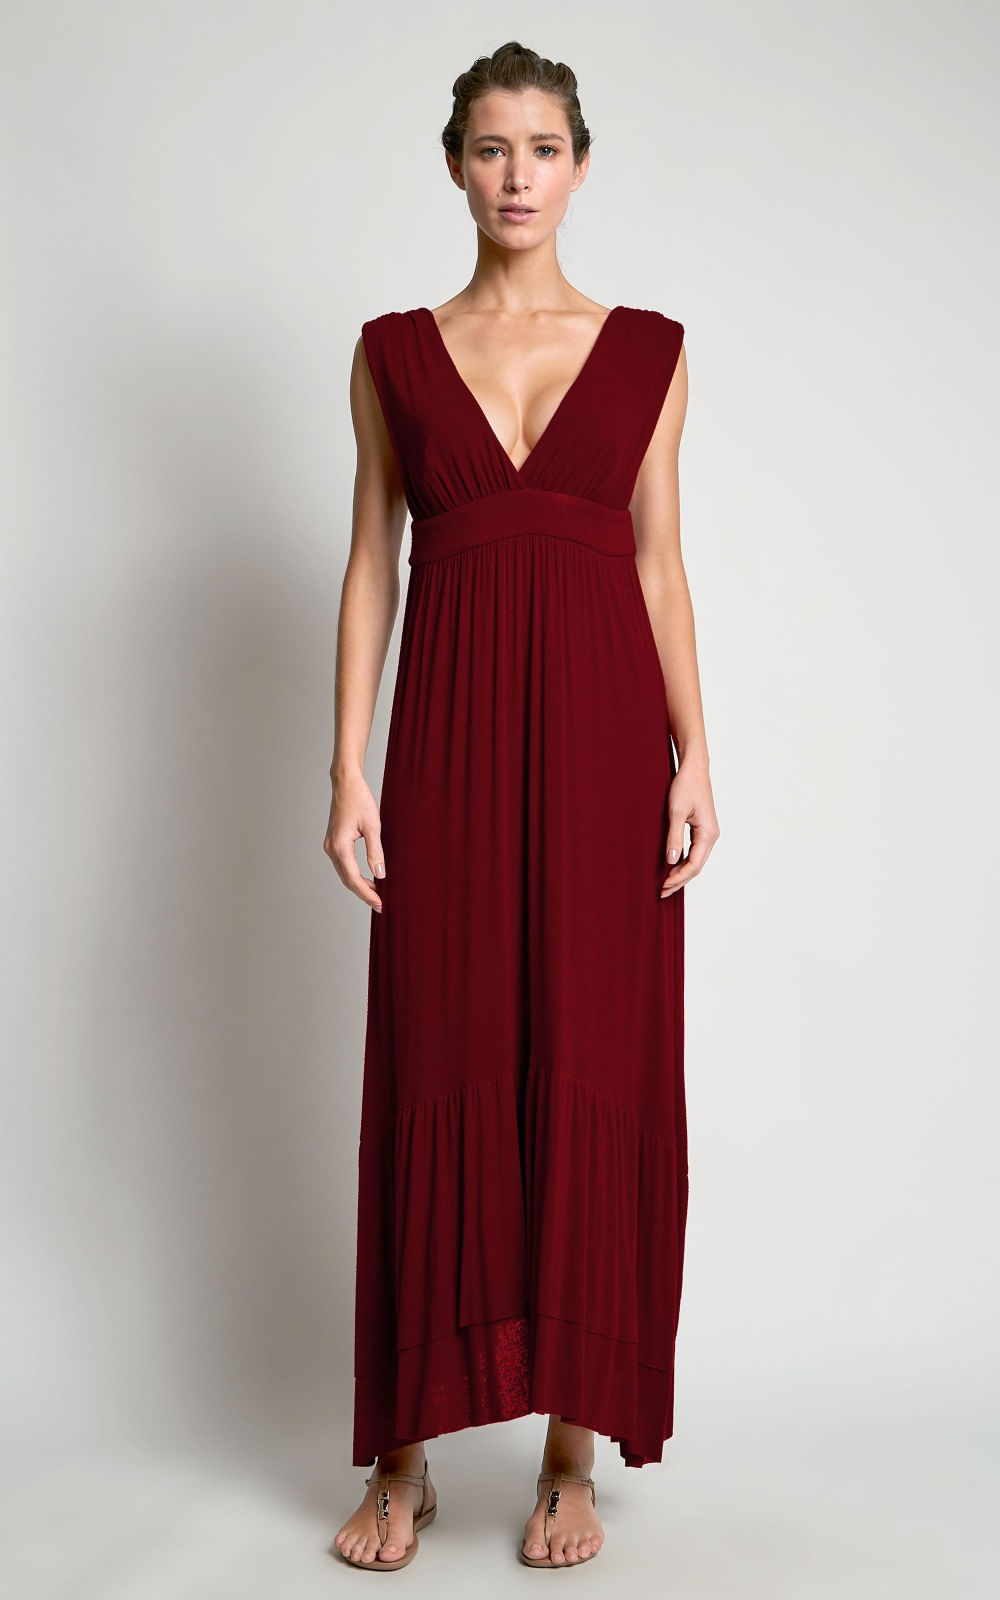 48096c234 Vestido Assimétrico Babados Rubi - Lenny Niemeyer